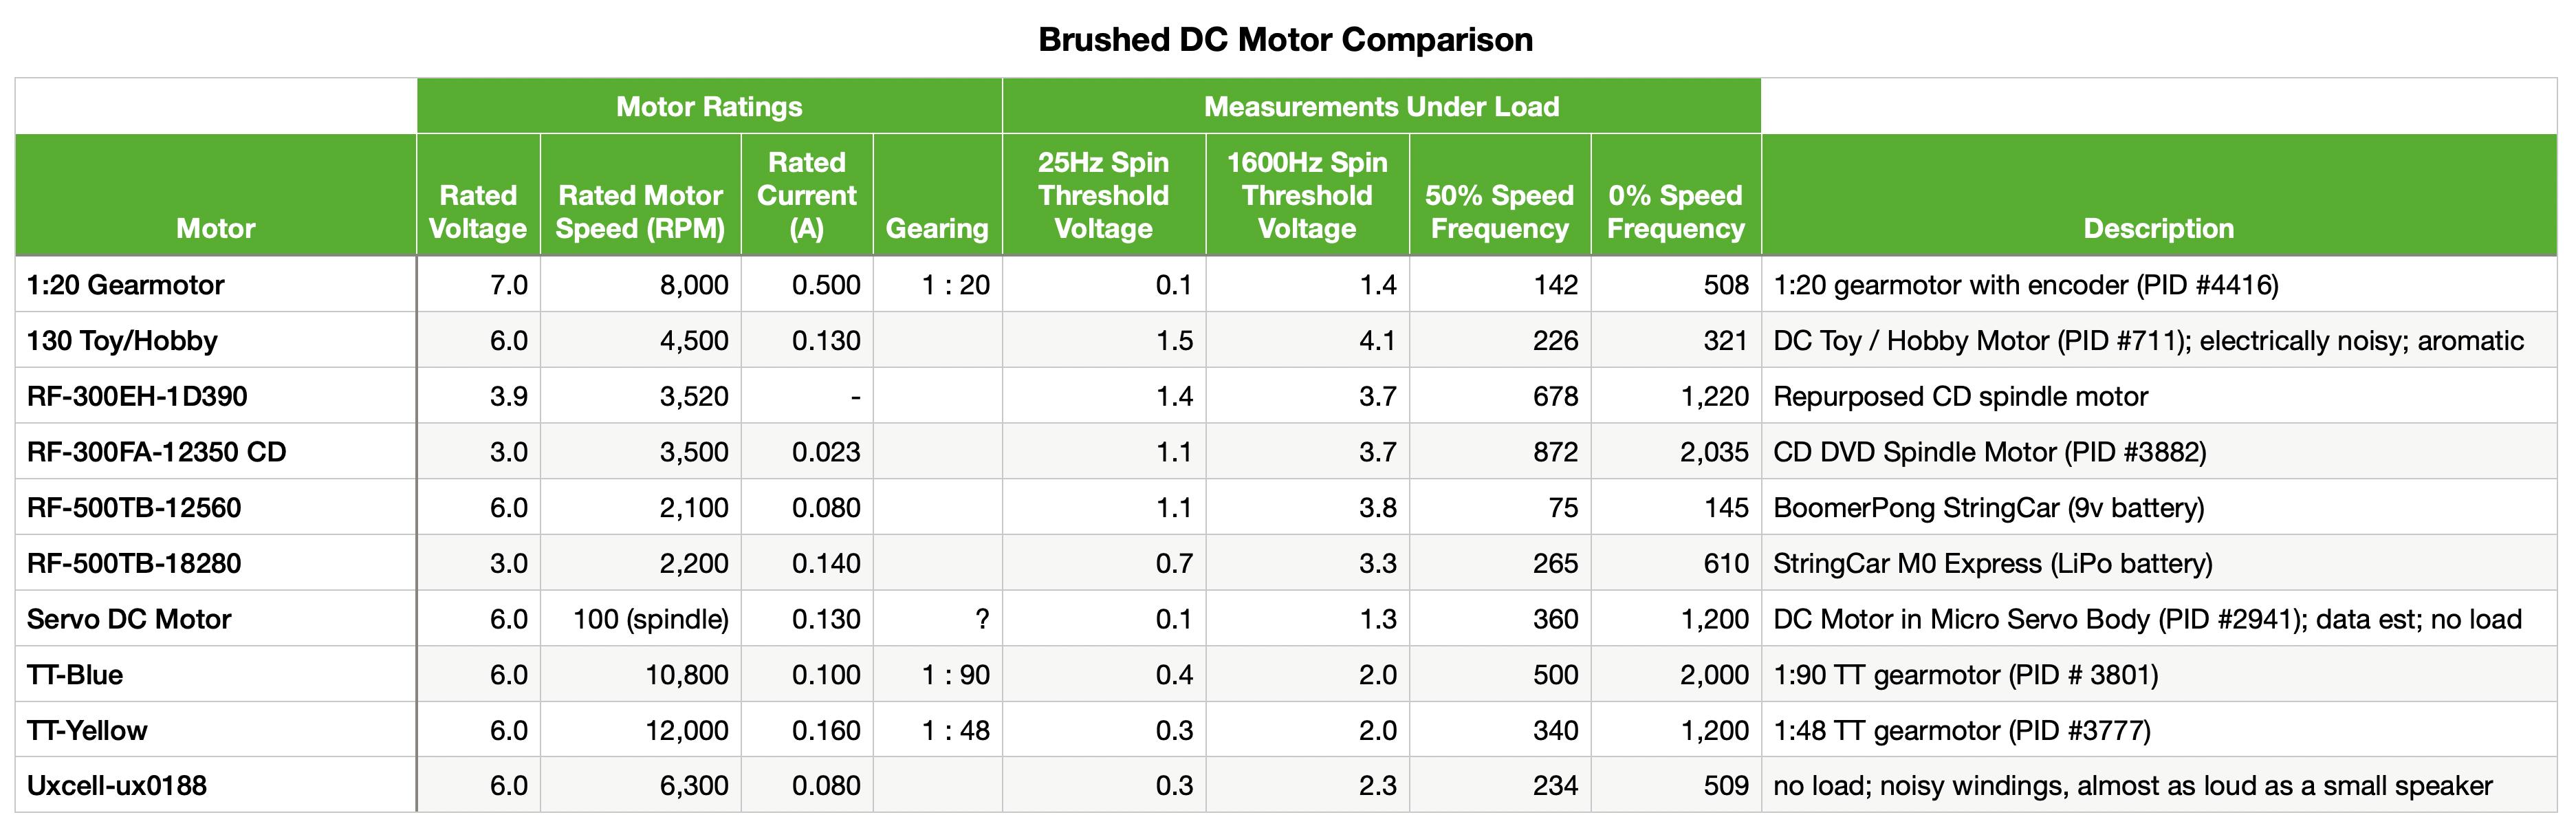 robotics___cnc_Brushed_DC_Motor_Comparison.png